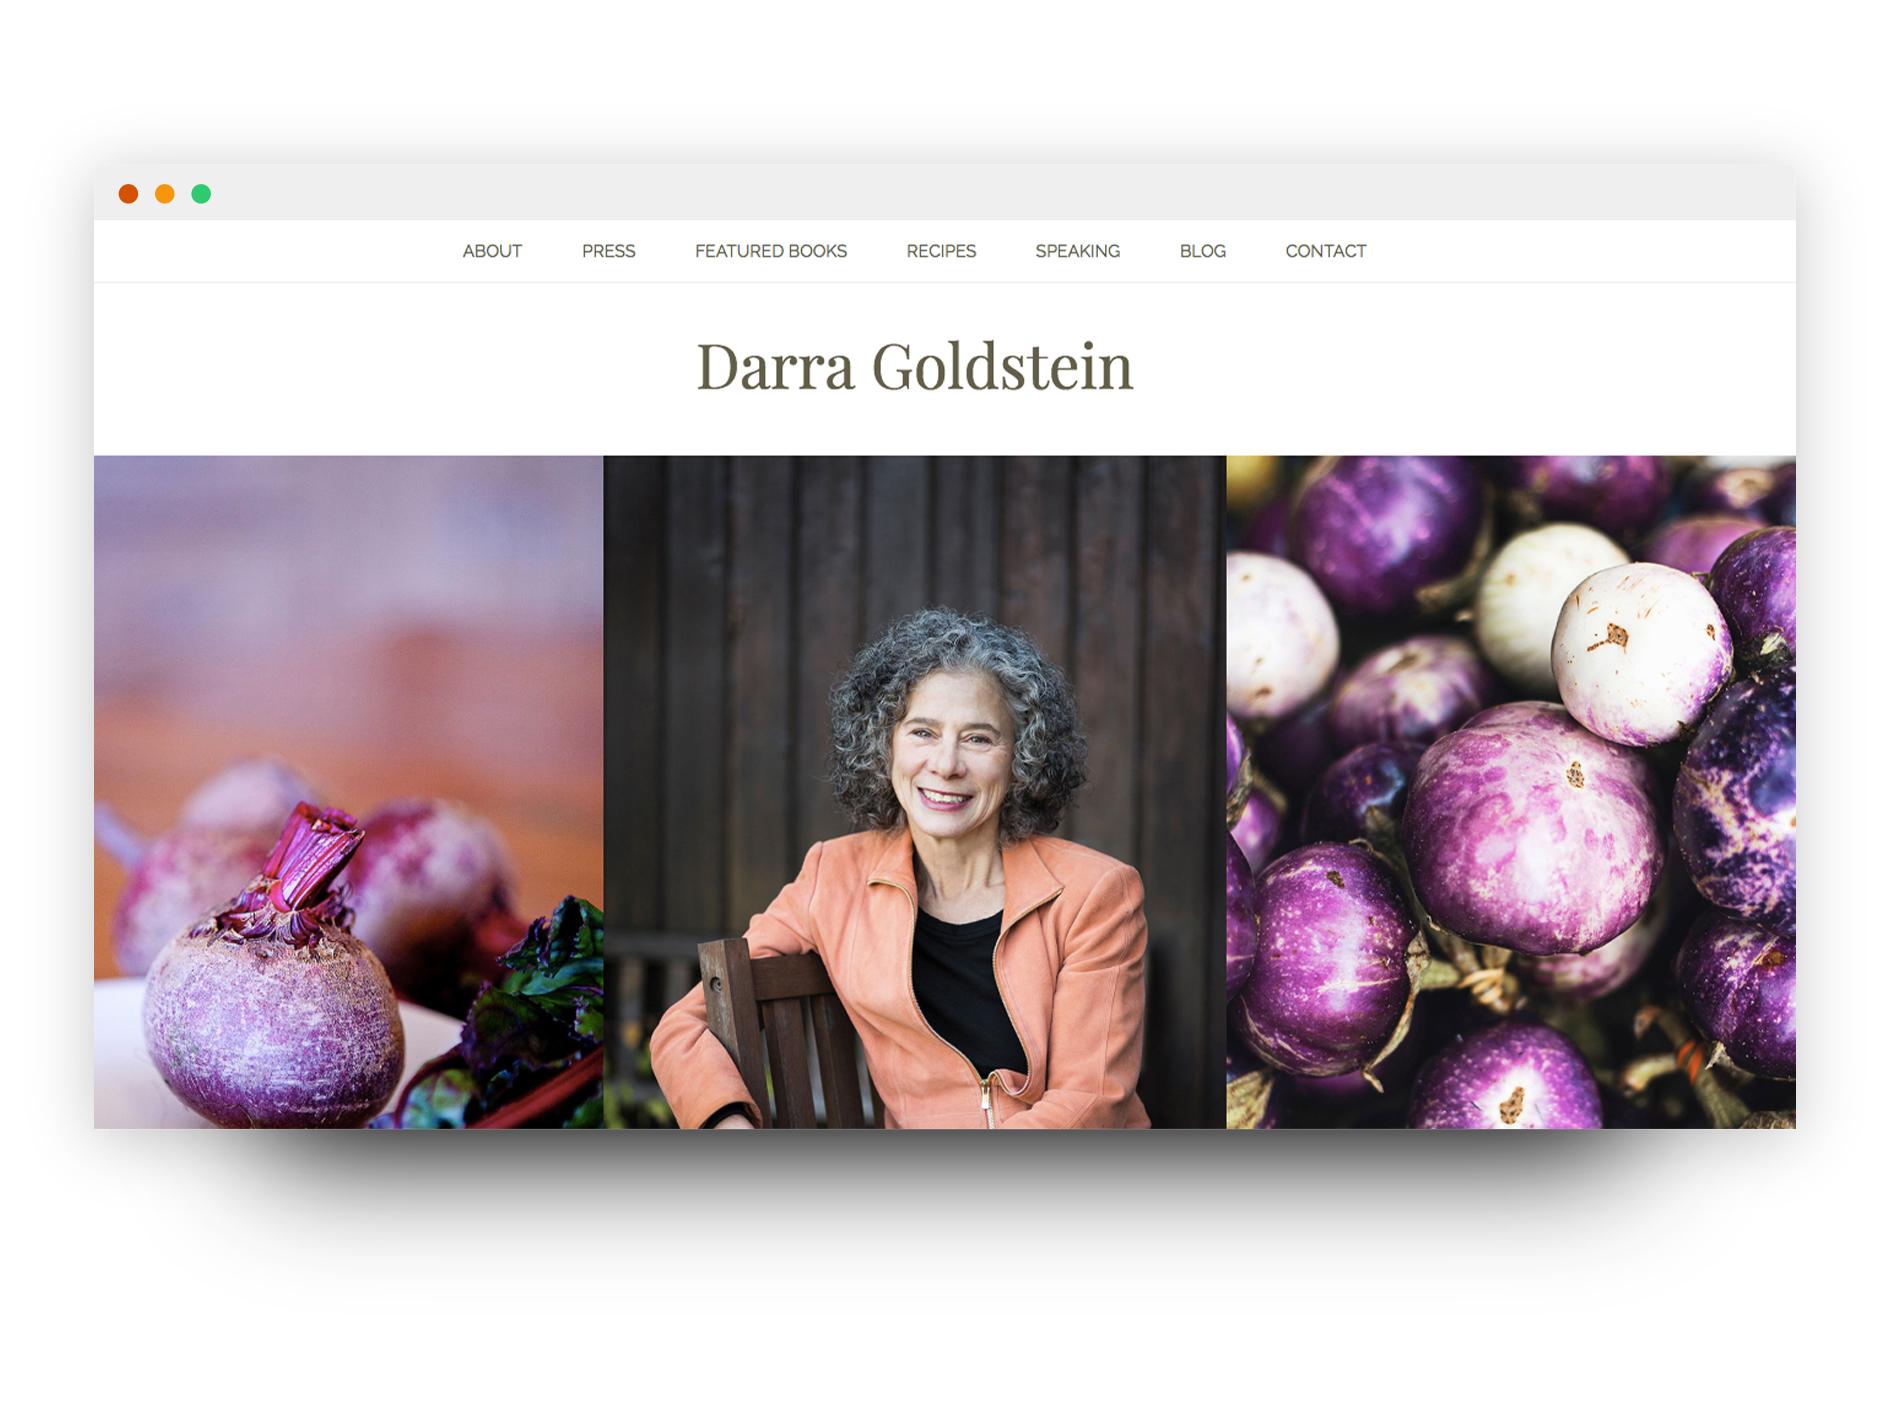 Darra Goldstein website mockup